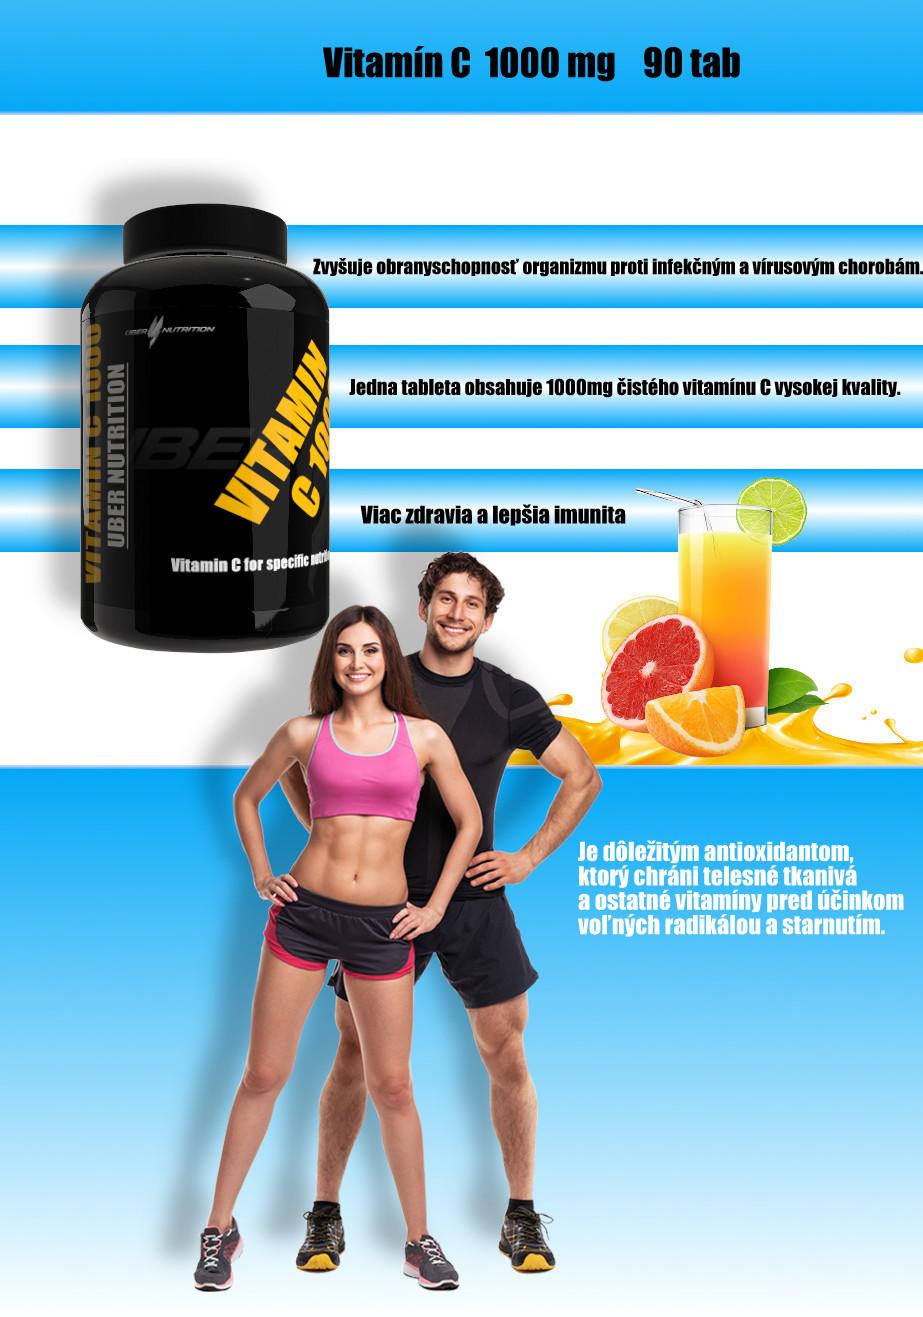 vitamin c plagat 1